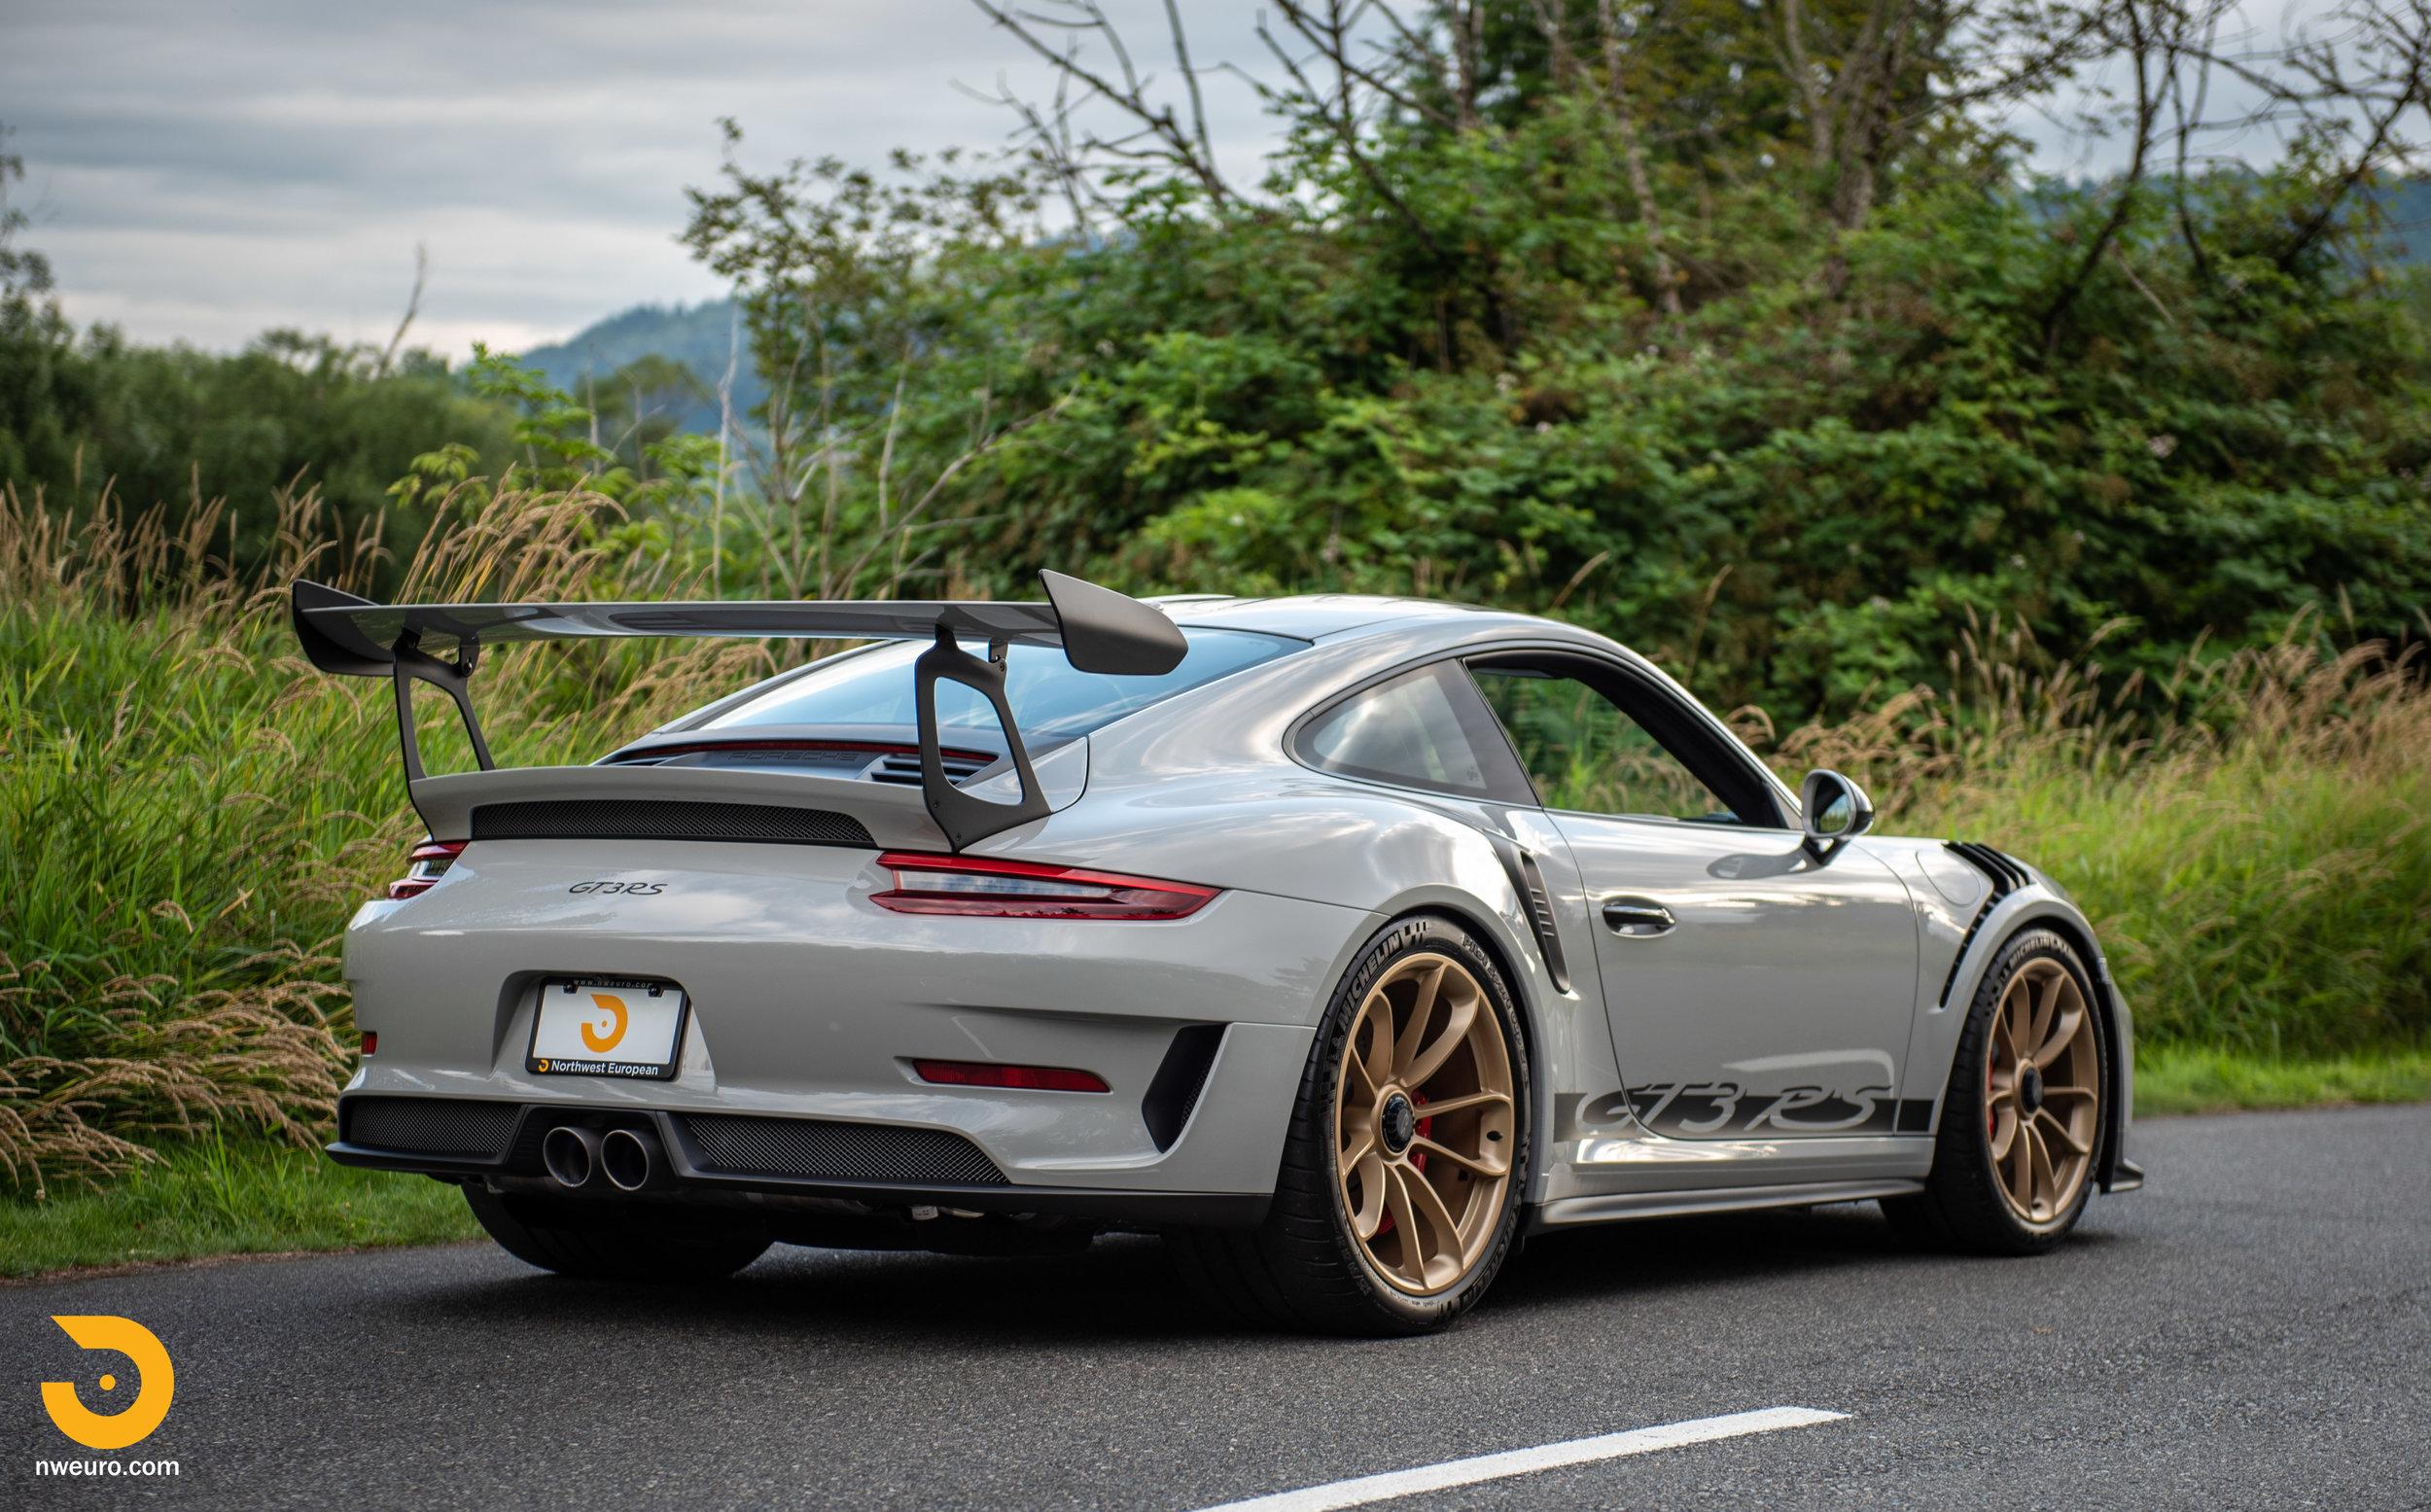 2019 Porsche GT3 RS - Chalk-57.jpg